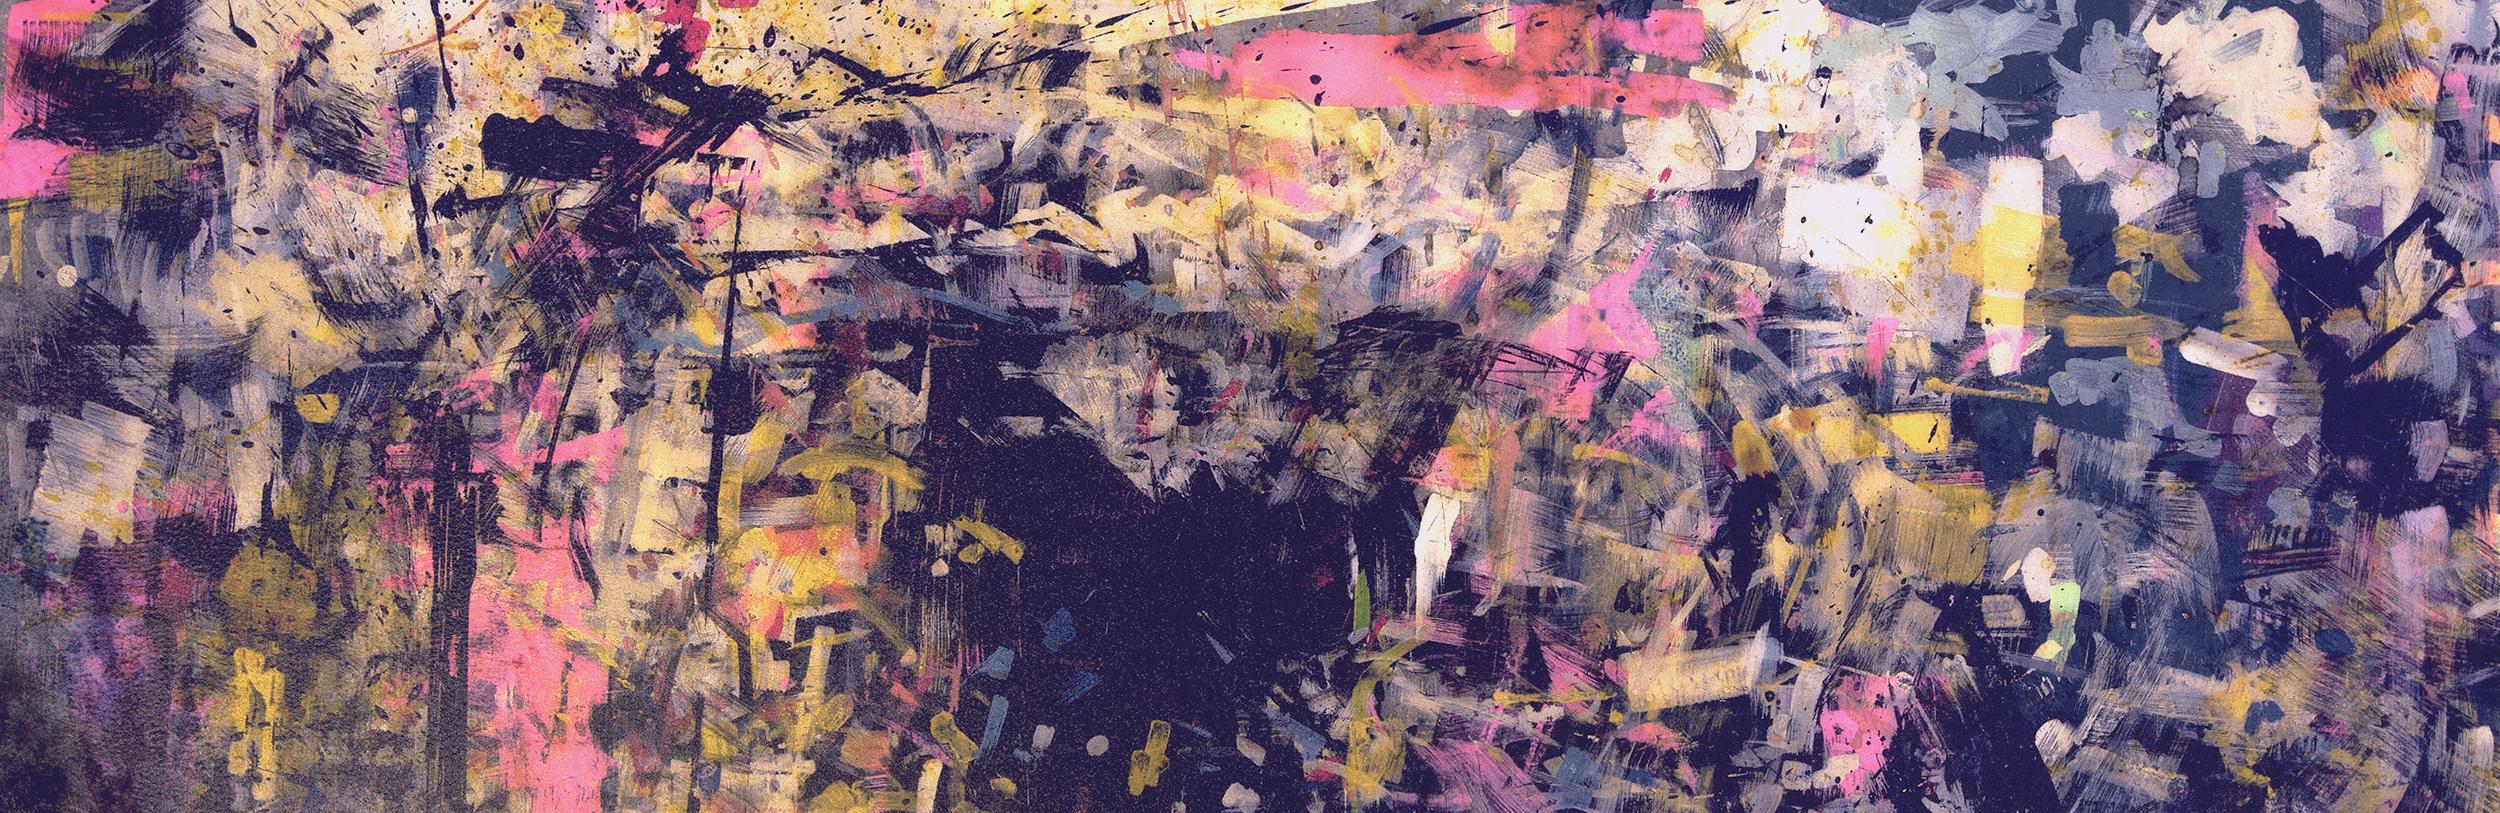 bonjourmolotov+covers+Illustration+Ilustracao+painting+pintura+acrylic+acrílico+canvas+tela+paper+cardboard+mdf+Andre+Gigante+04+N2.jpg